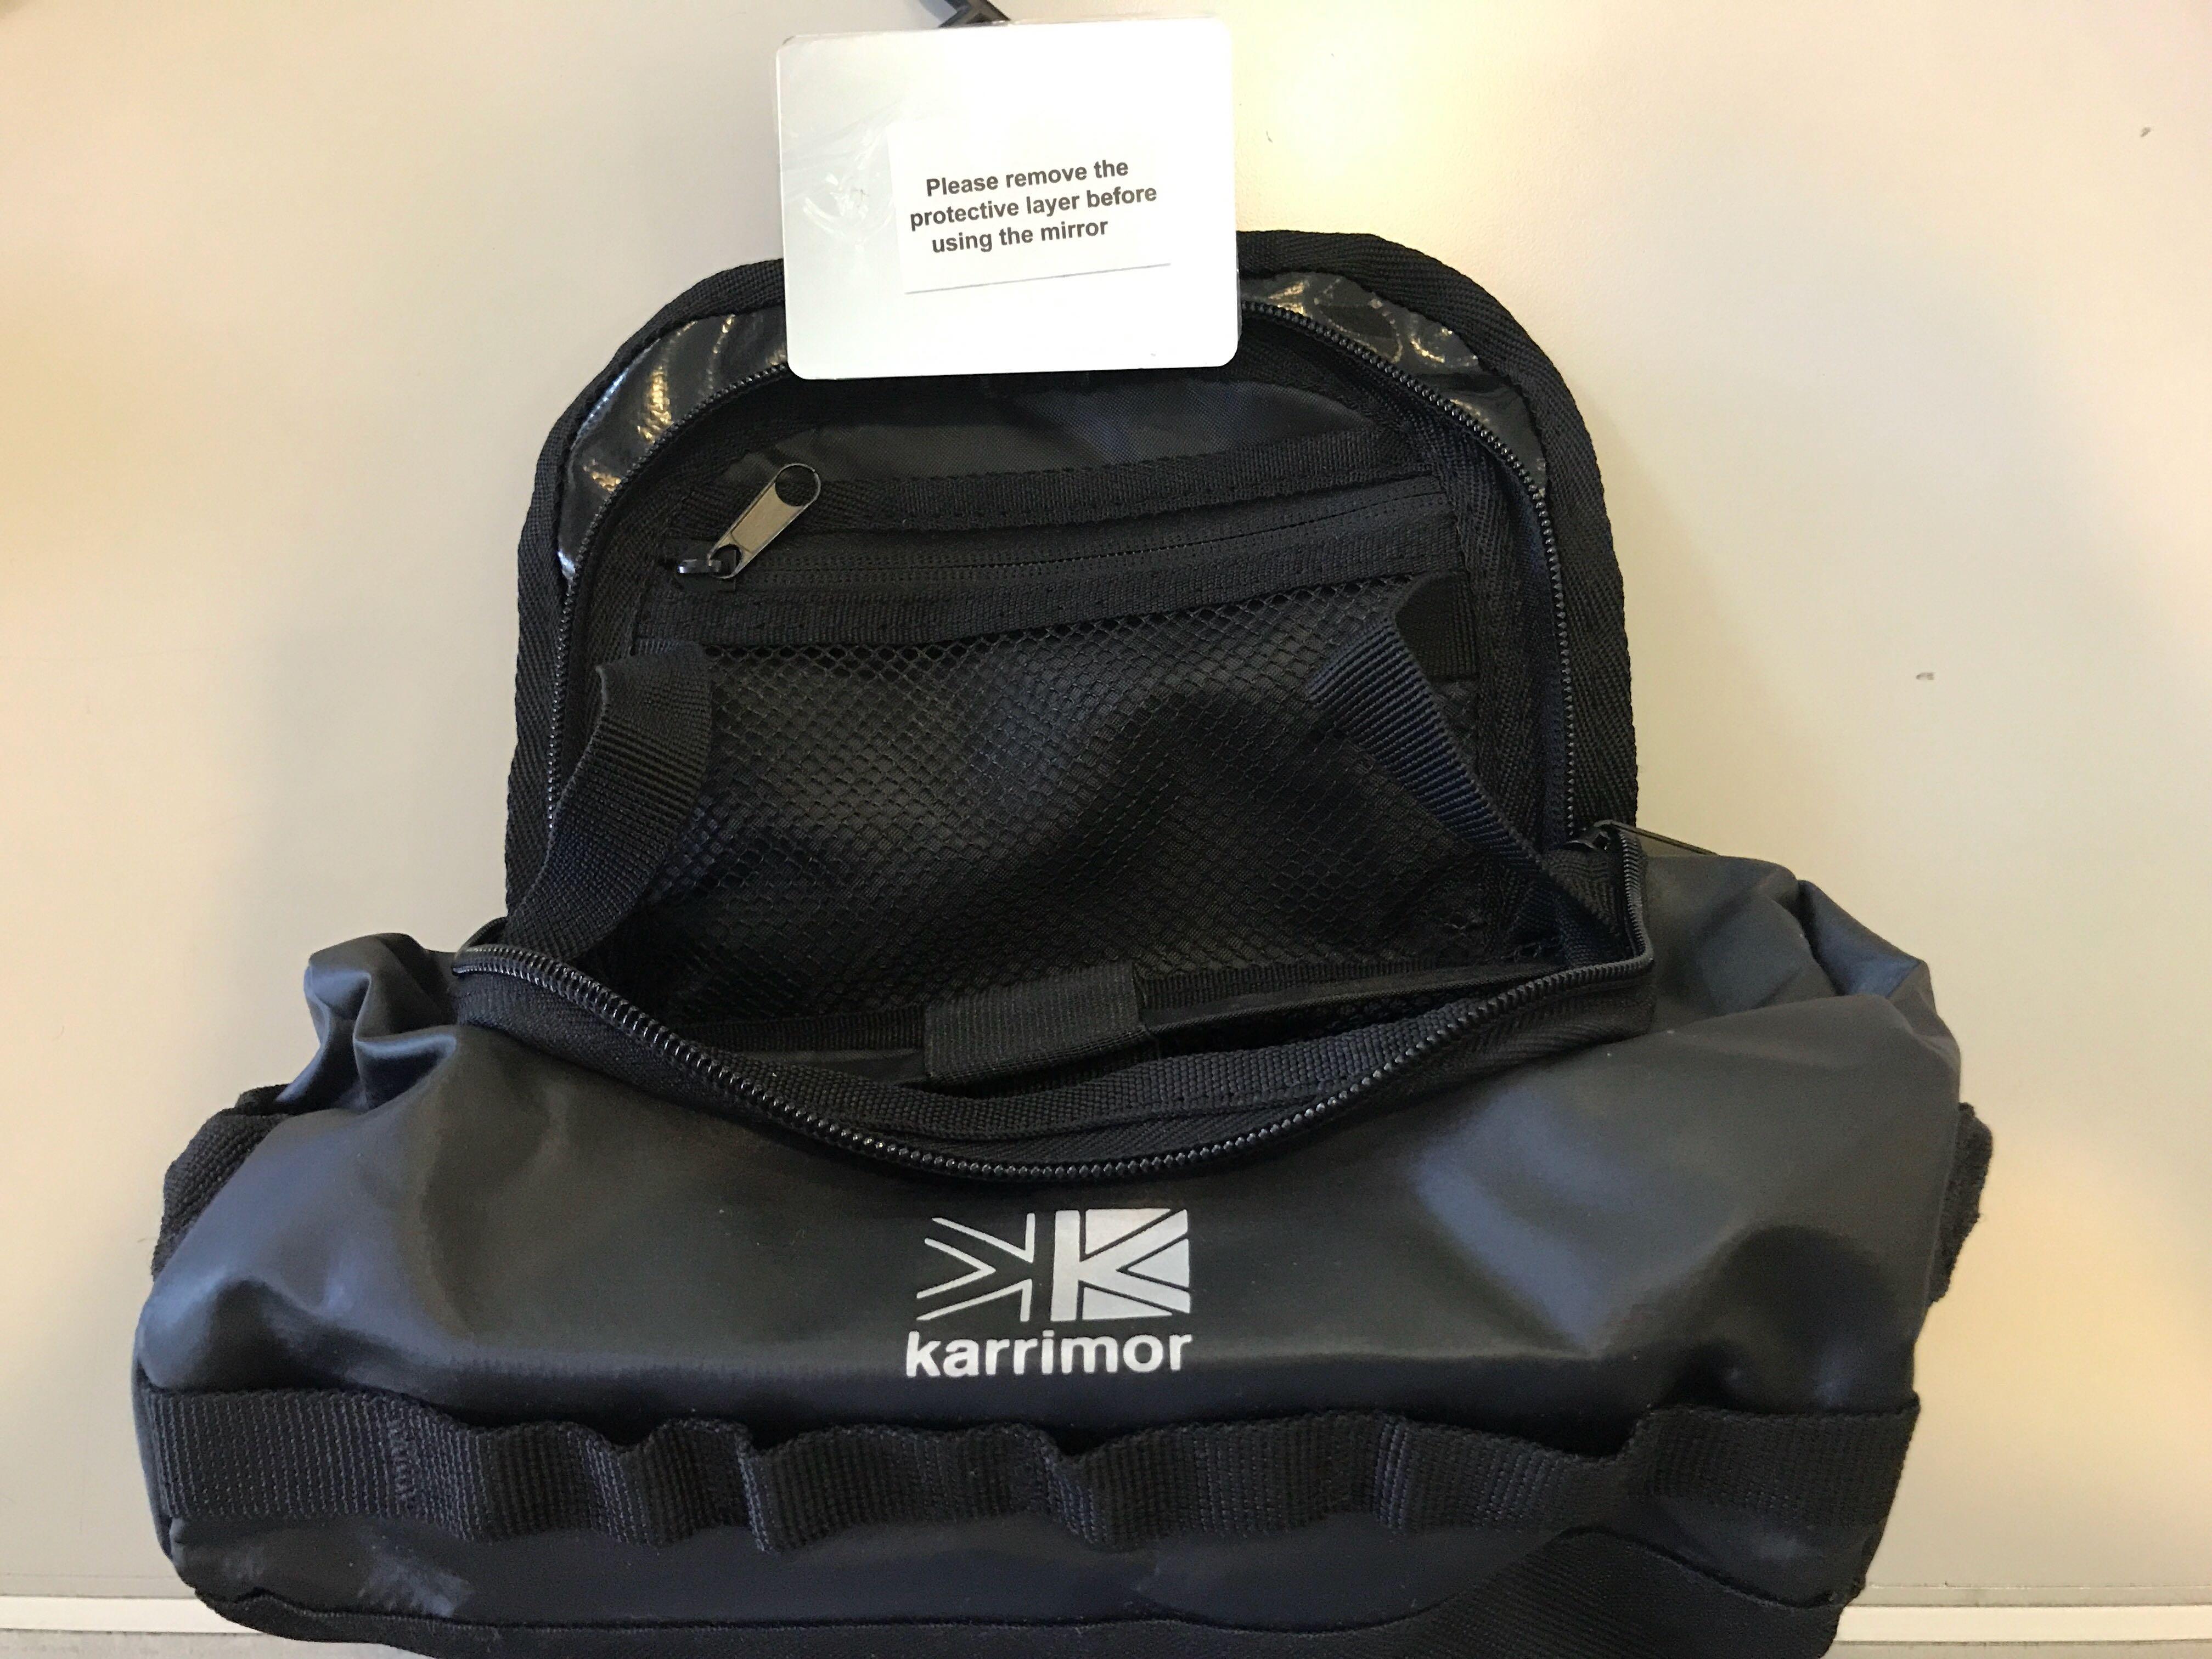 a15de08cb7 Karrimor toiletry bag for outdoor use